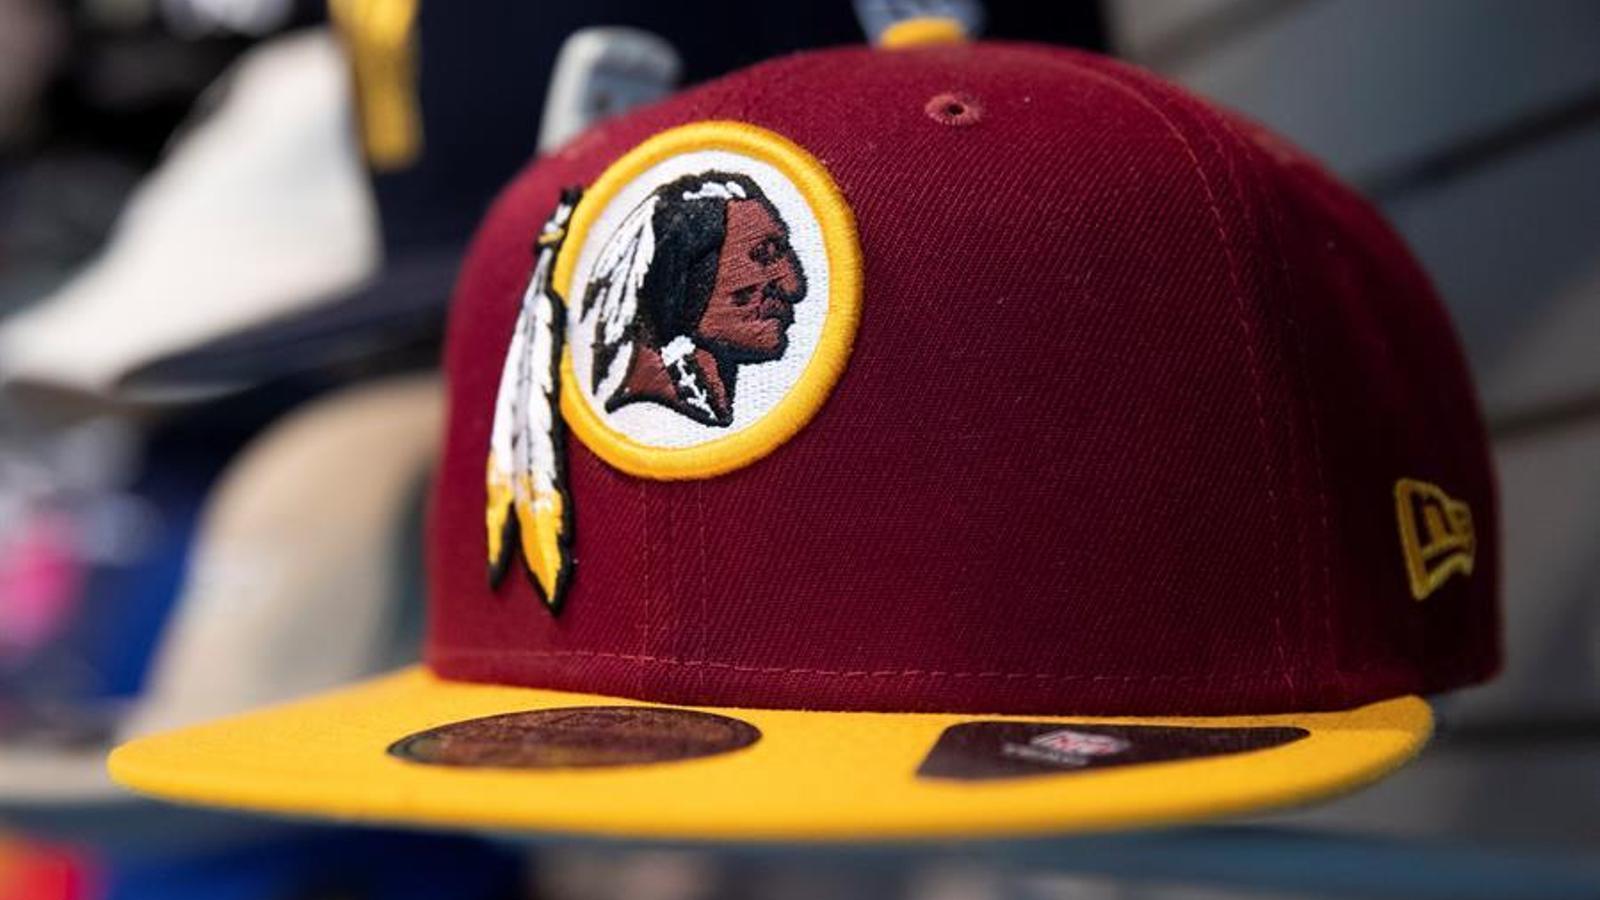 Els Washington Redskins, l'equip sense nom